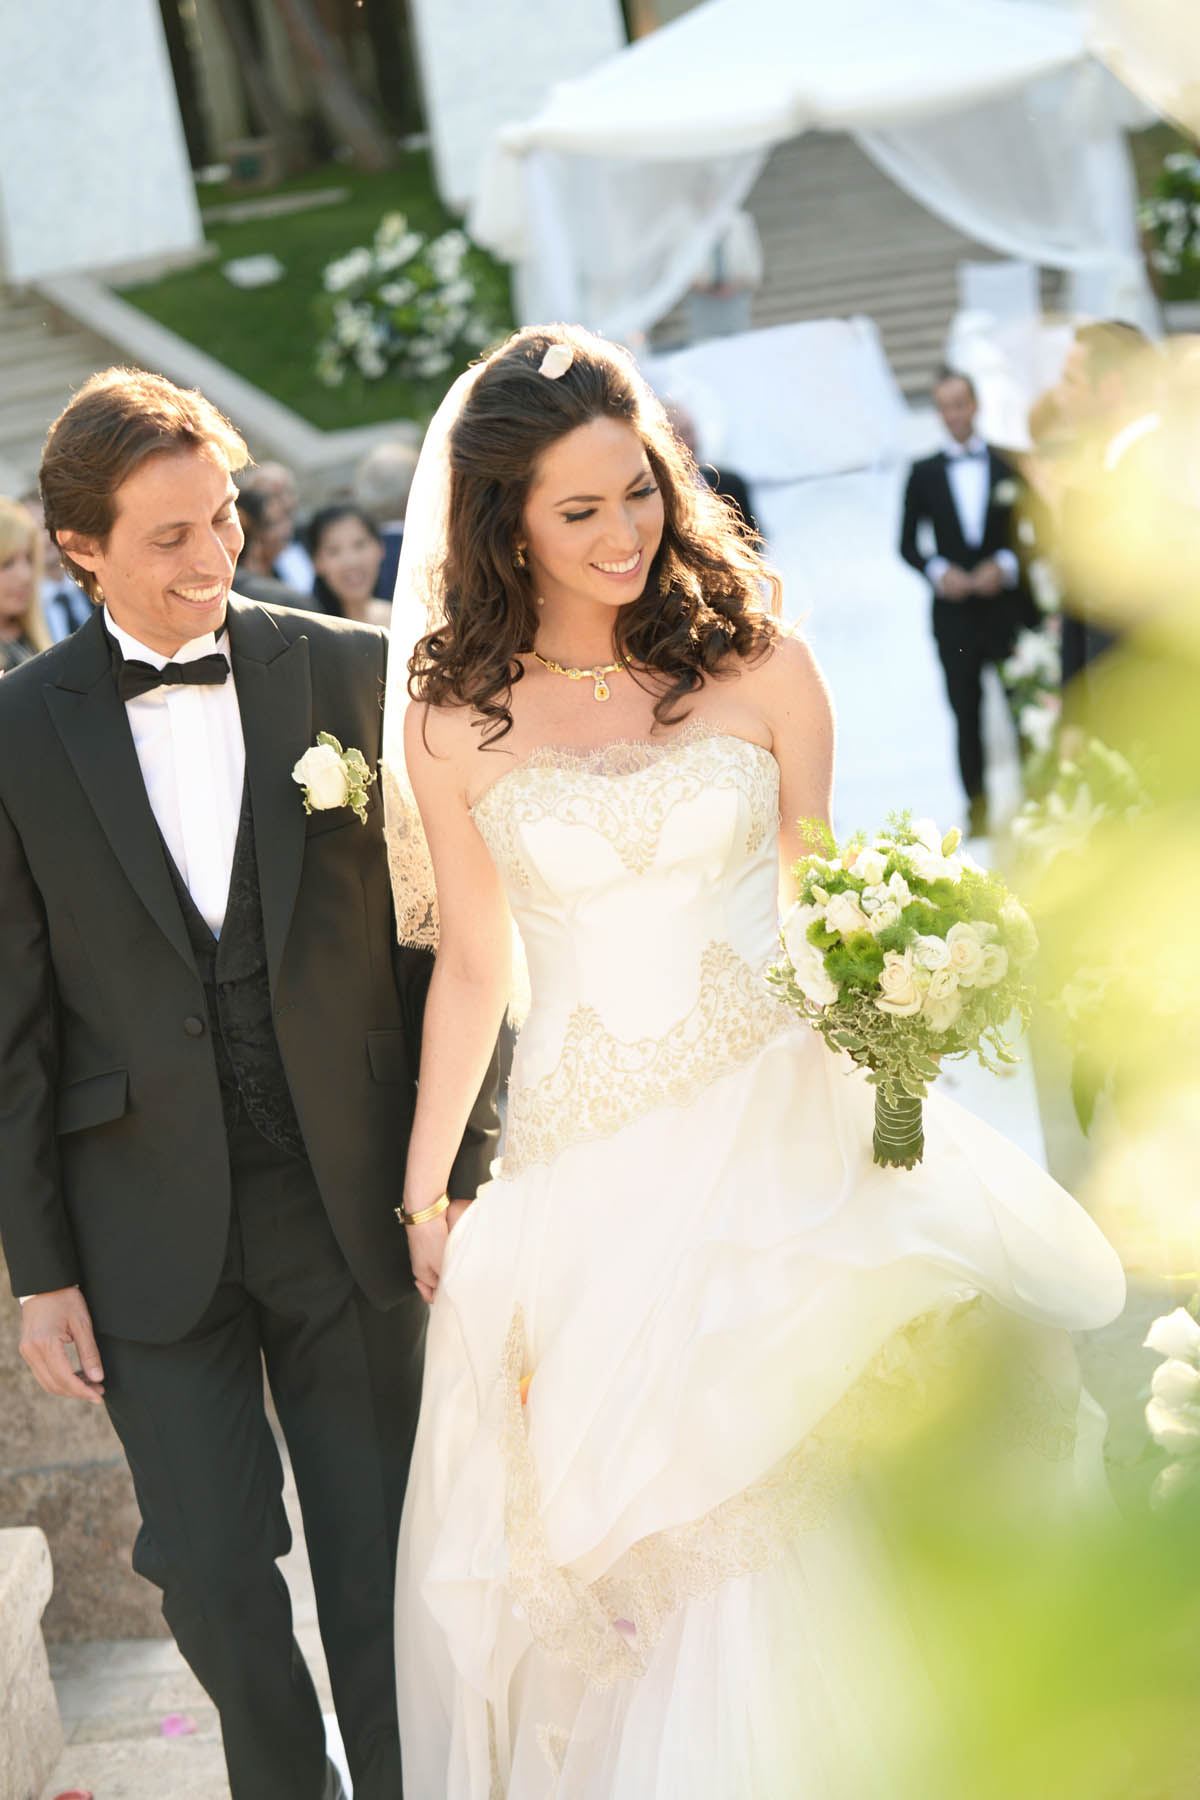 Villa Padierna weddings